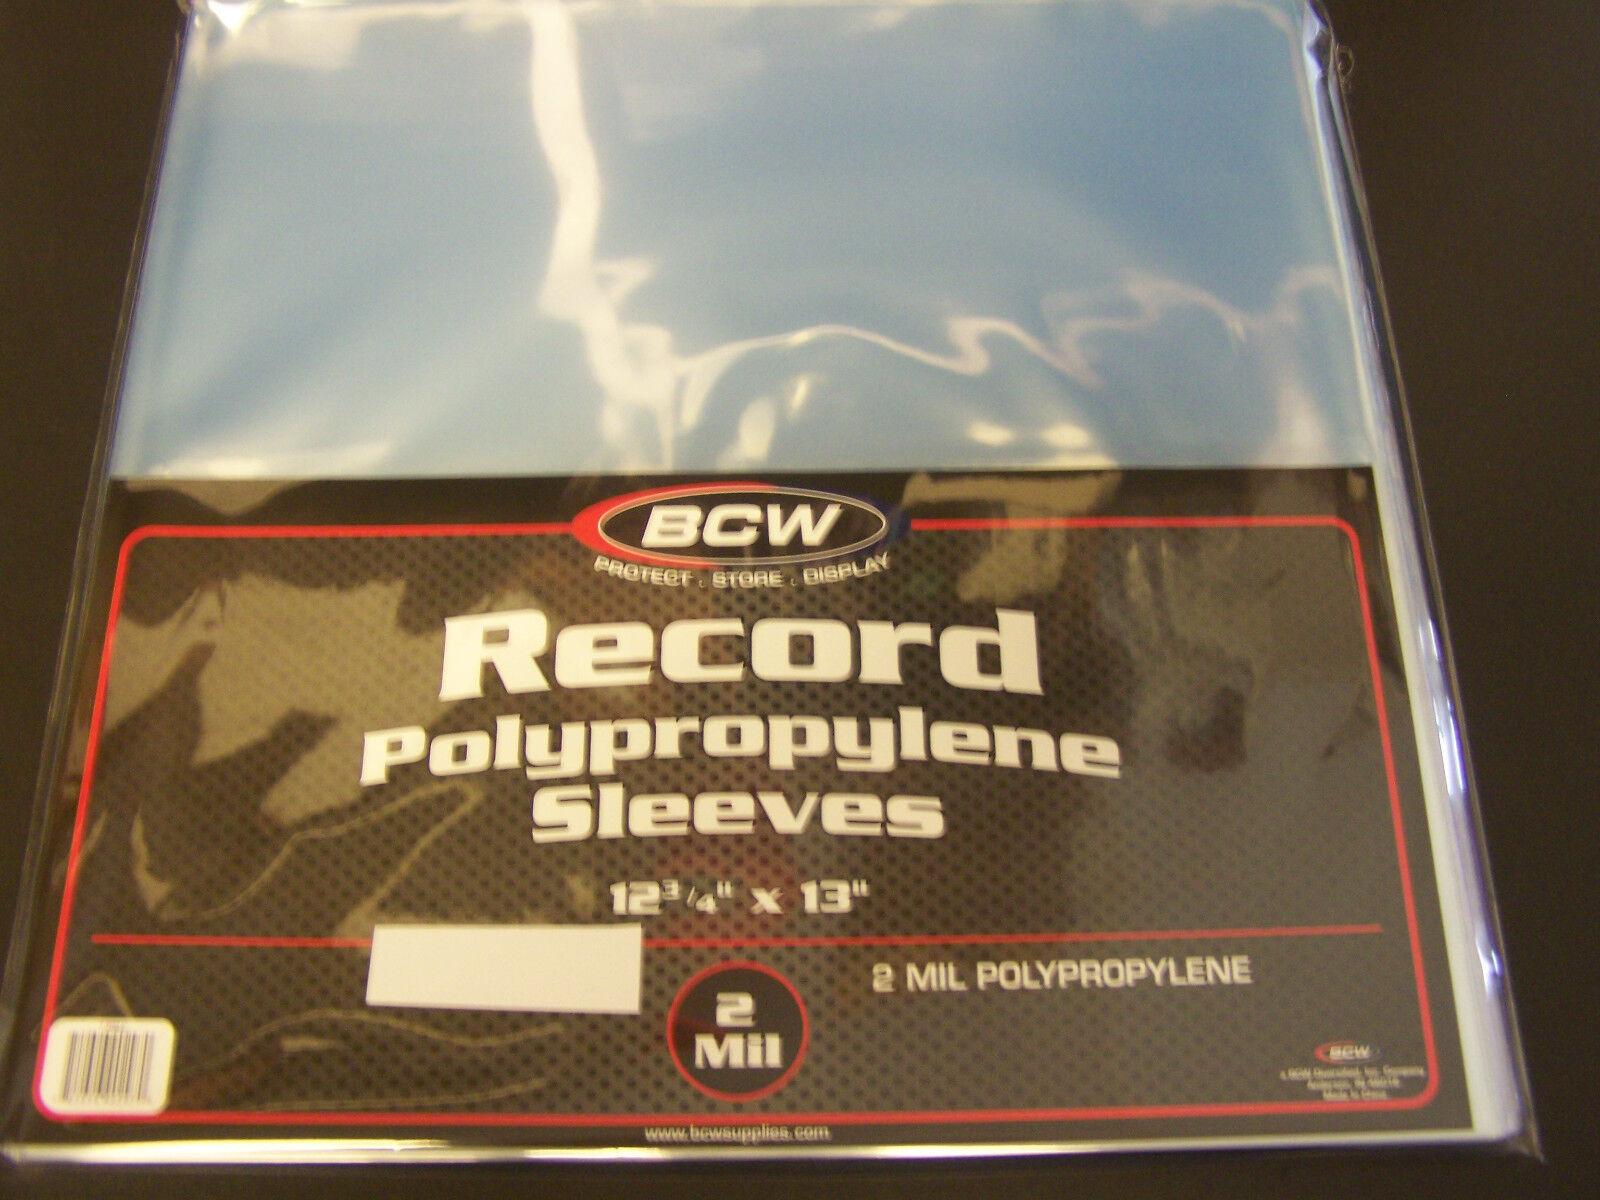 50 Loose - Vinyl / Record 33 Rpm Sleeves 12